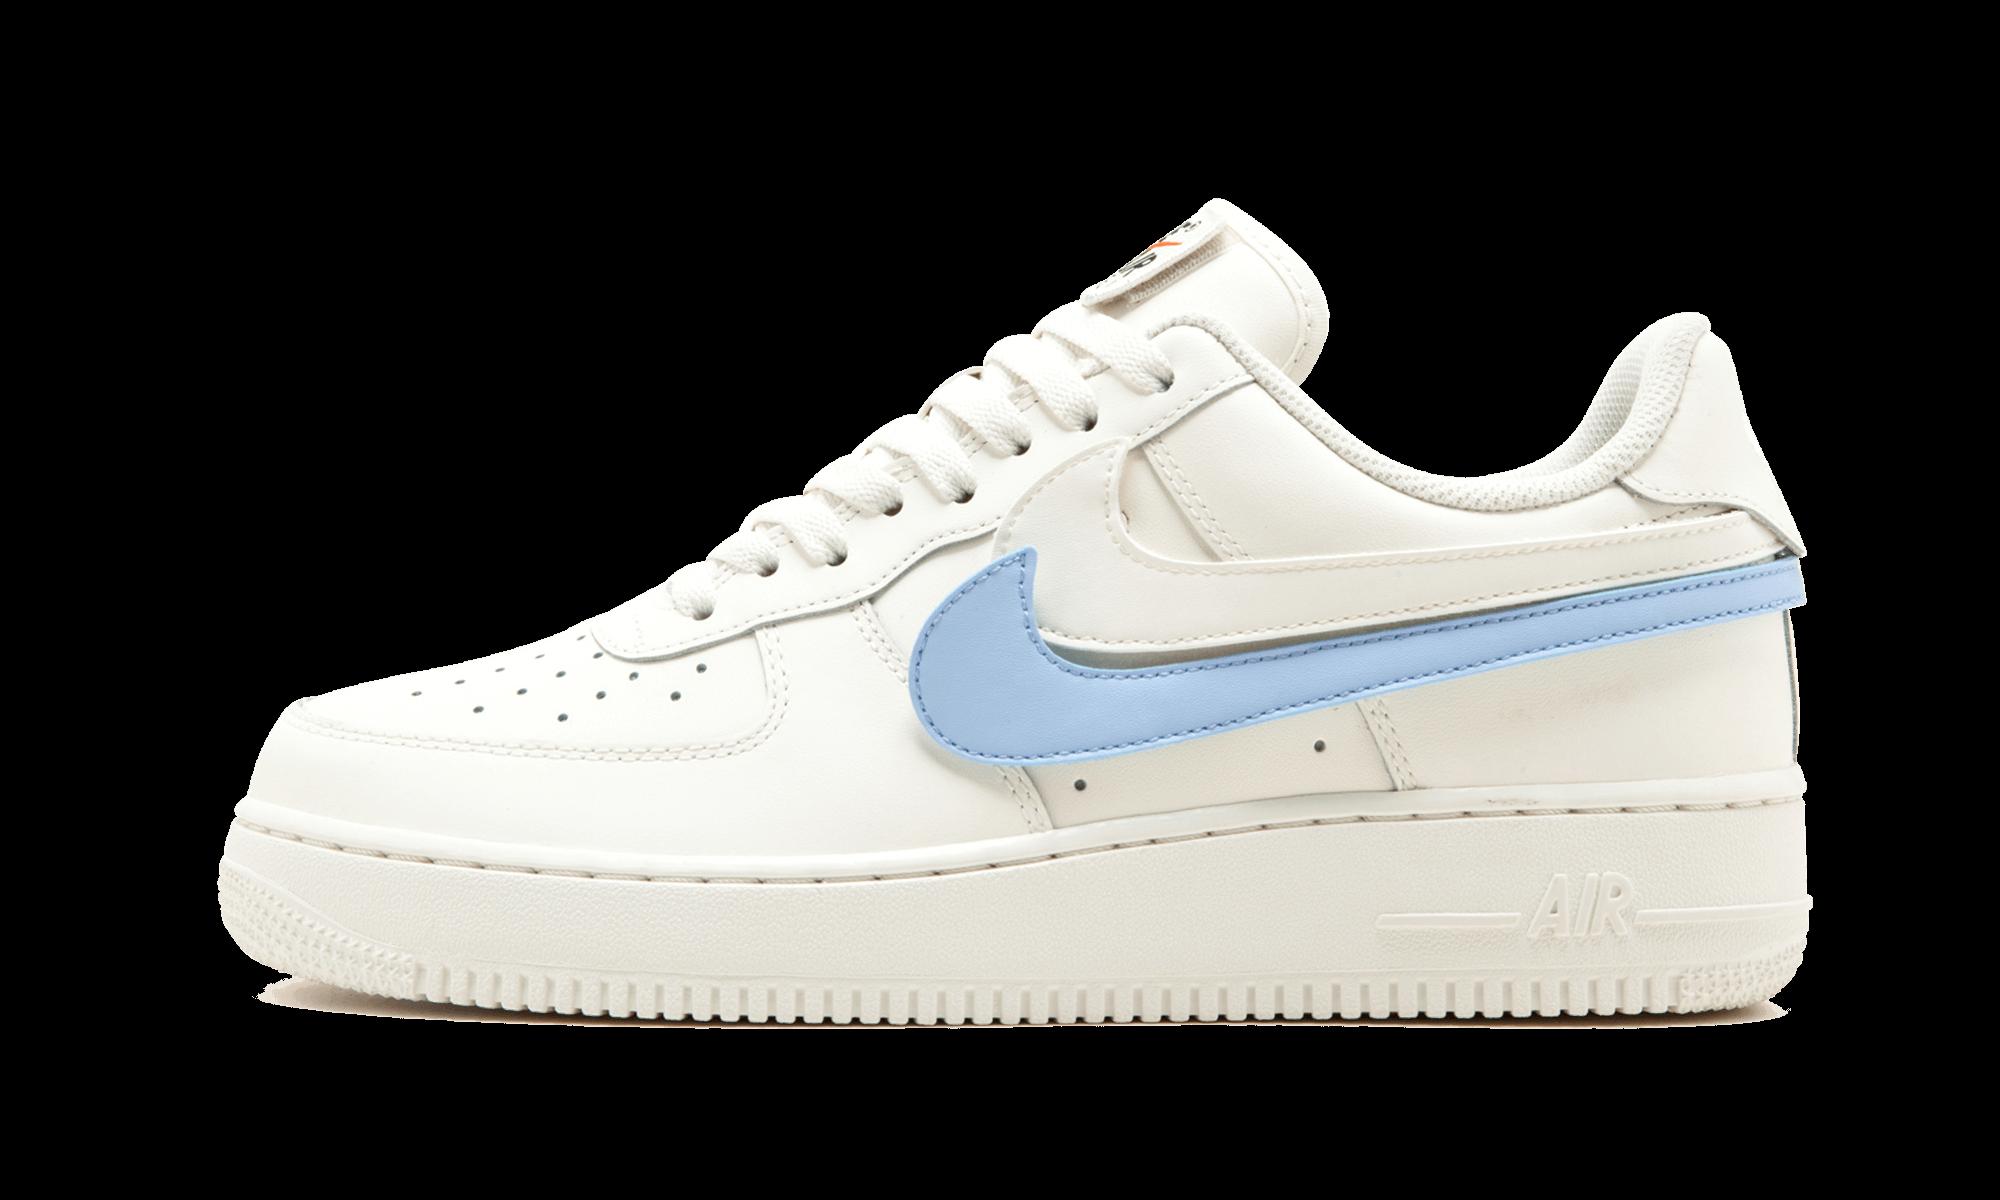 Nike Air Force 1 07 Qs Ah8462 101 2021 Nike Air Force Nike Air Nike